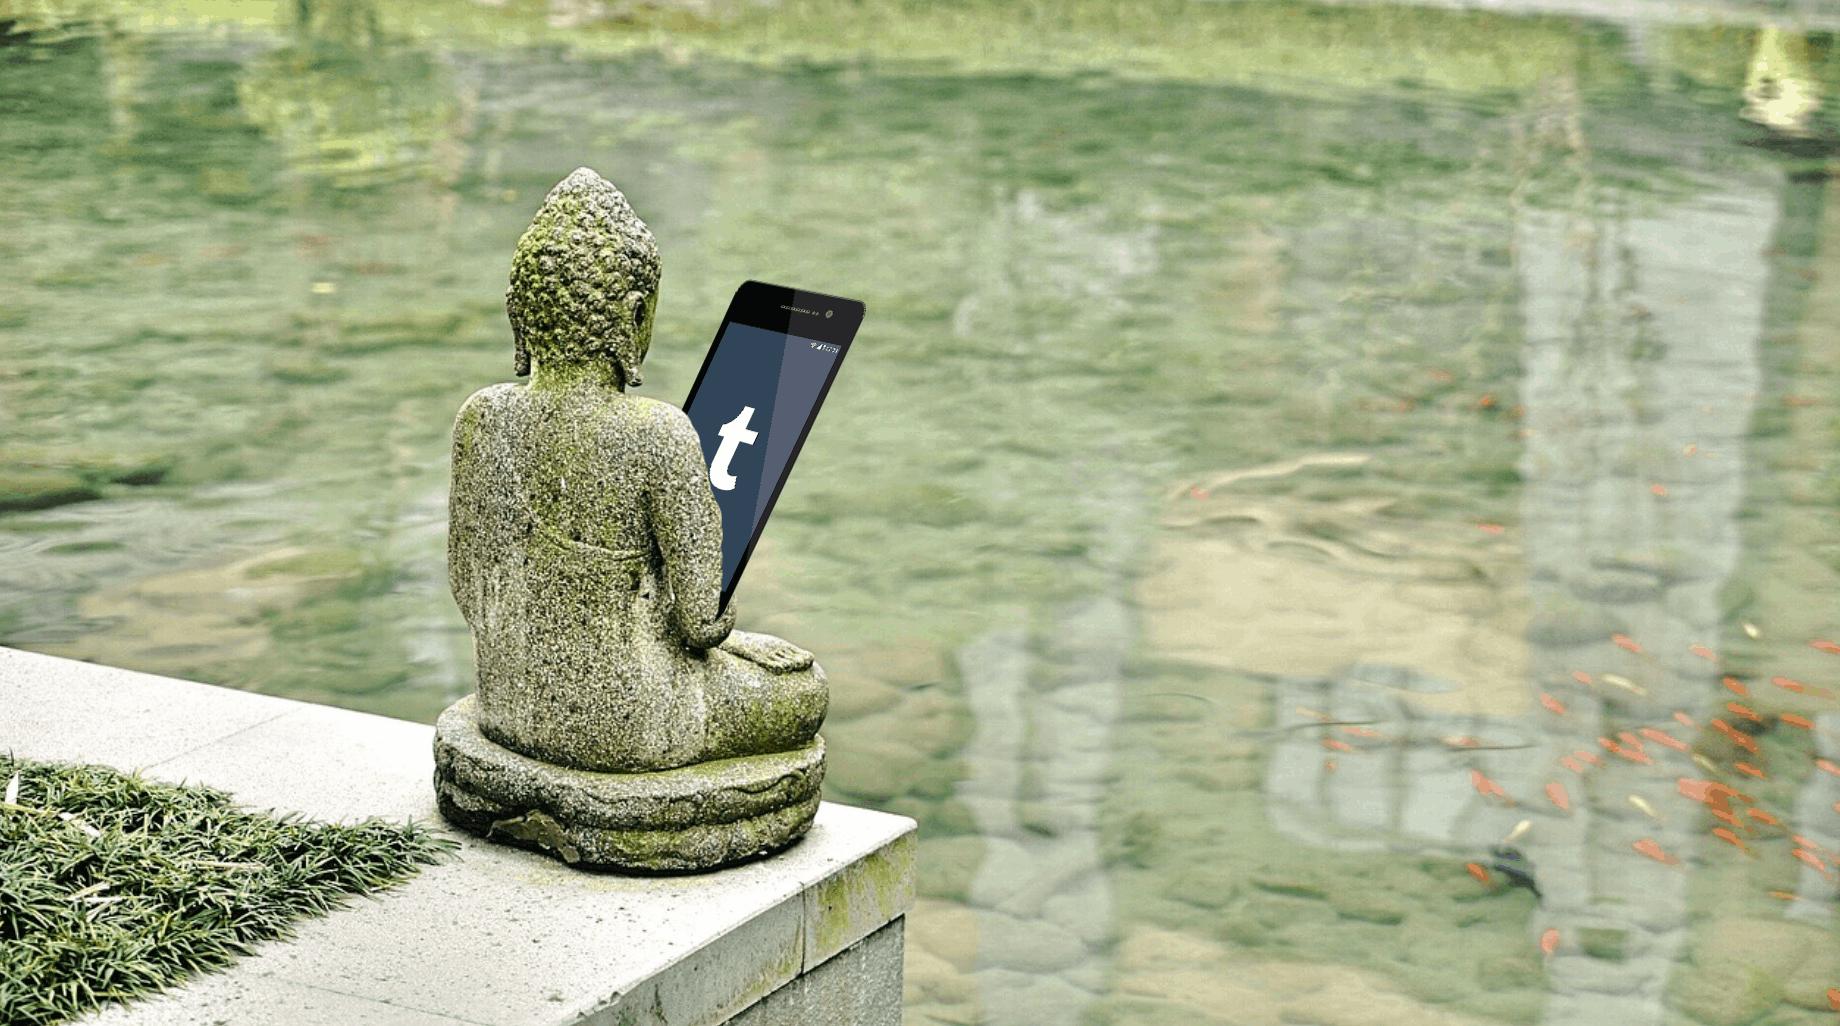 Unblock Tumblr China – 1 – Buddha on his phone